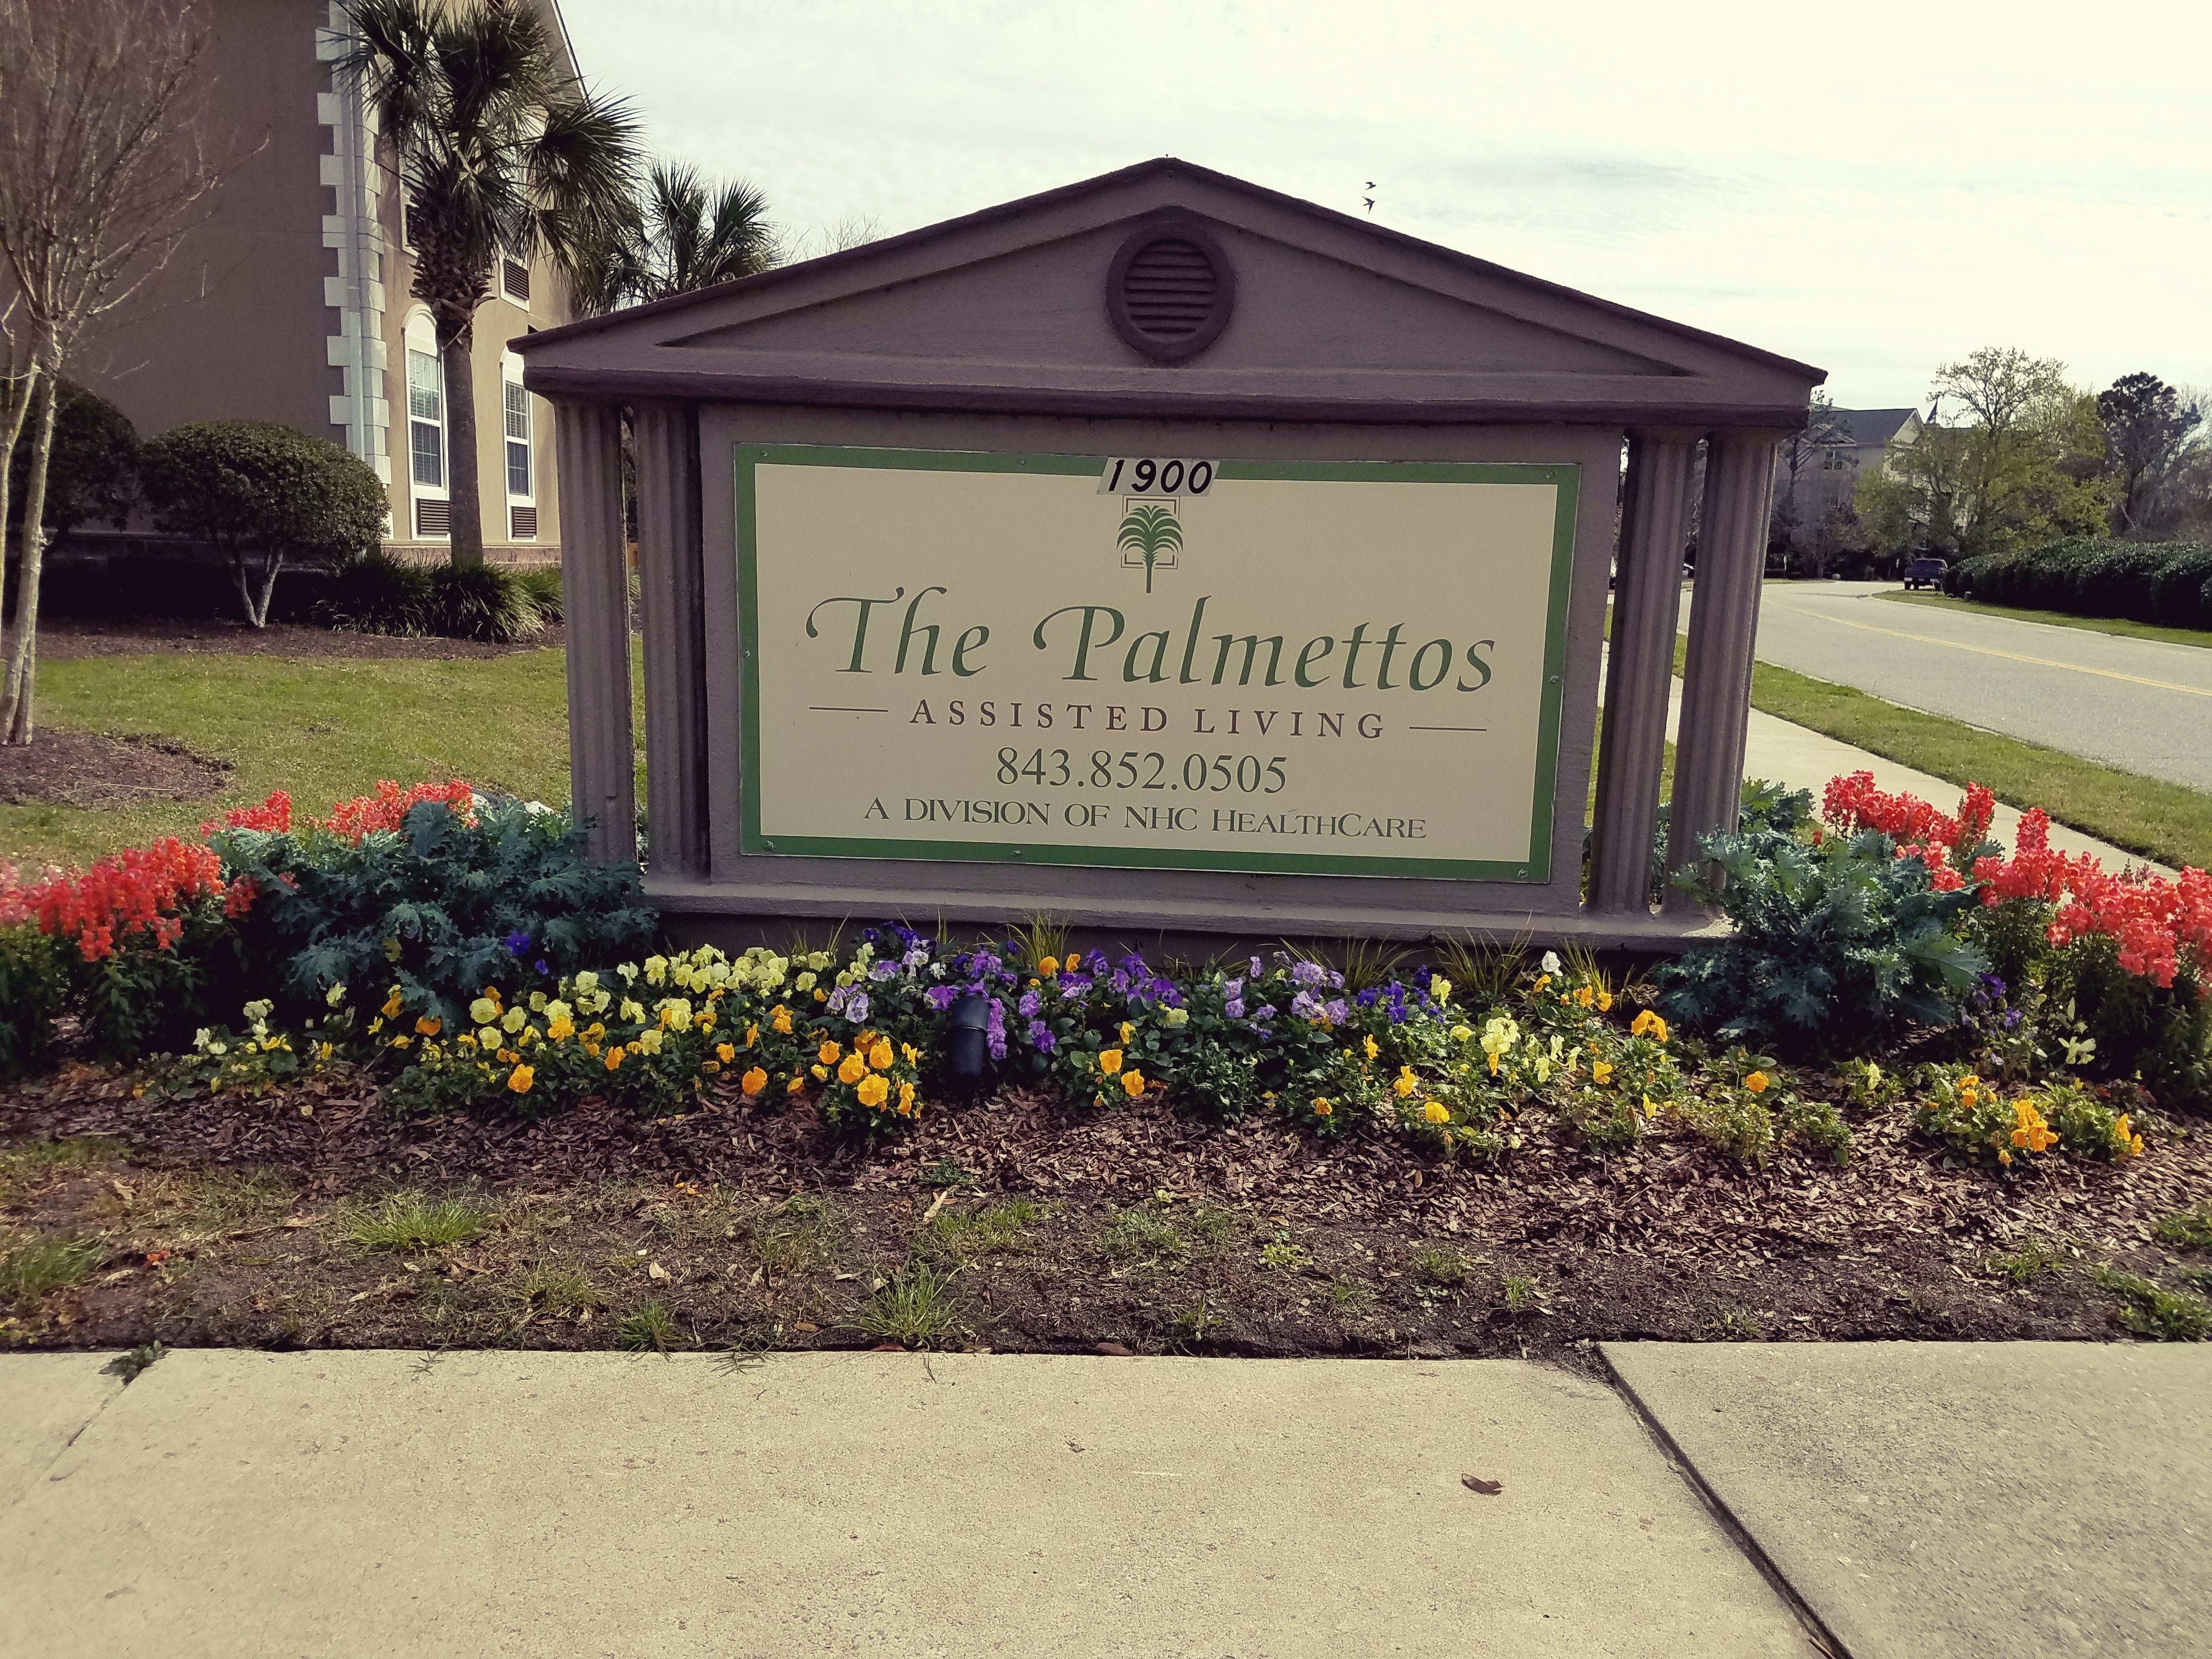 Photo 1 of The Palmettos of Charleston